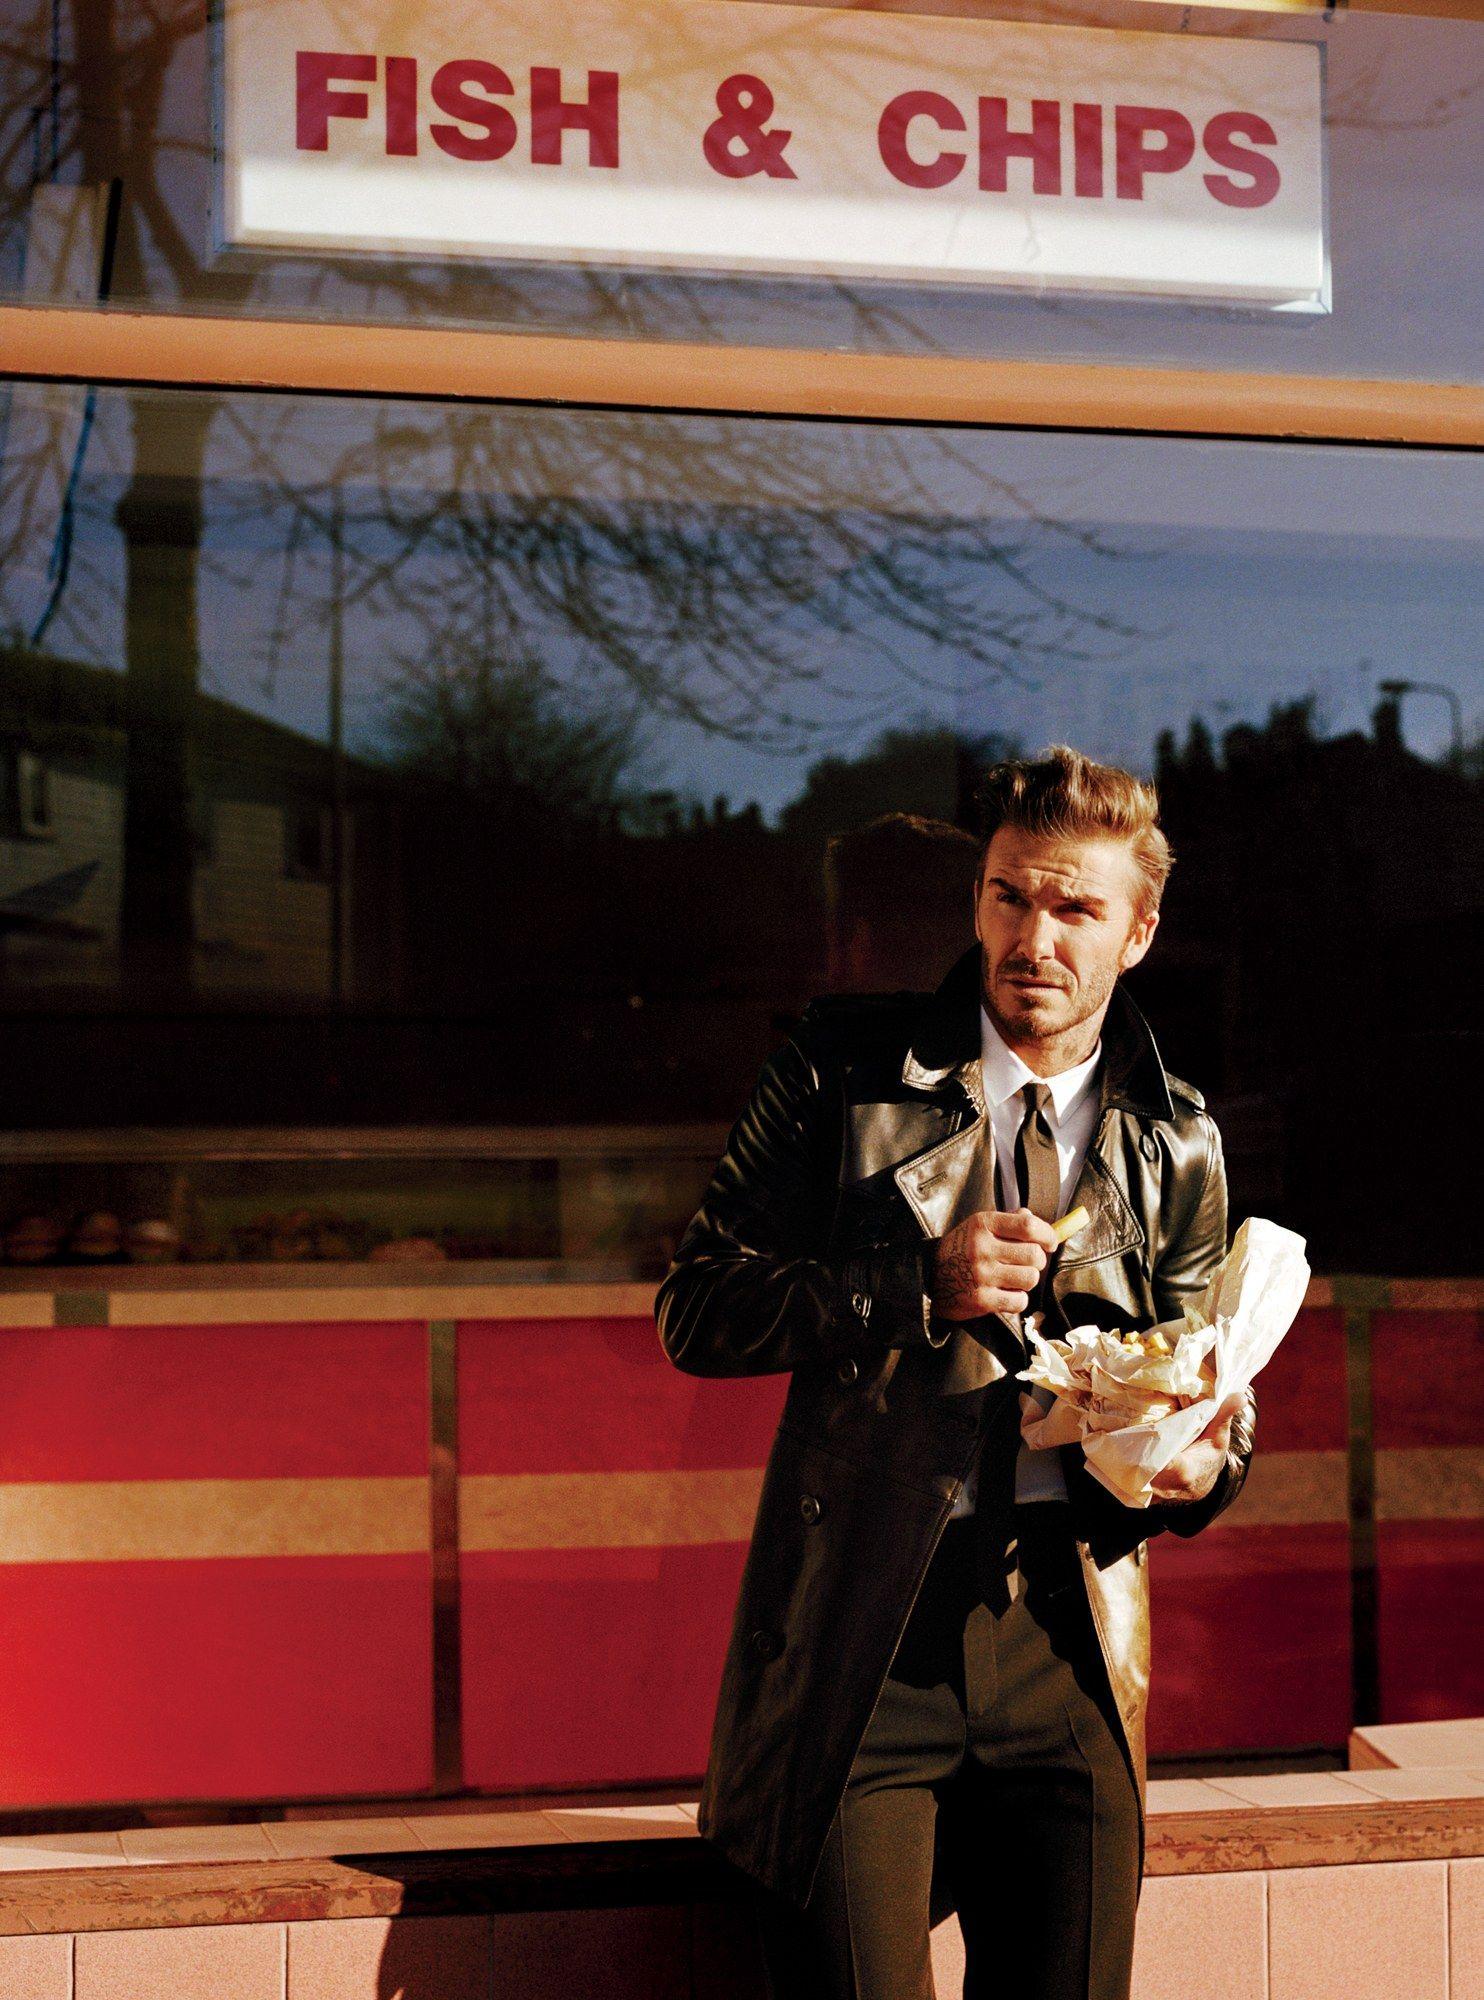 Mens leather gloves gq - Photos David Beckham S Gq Cover Shoot Gq